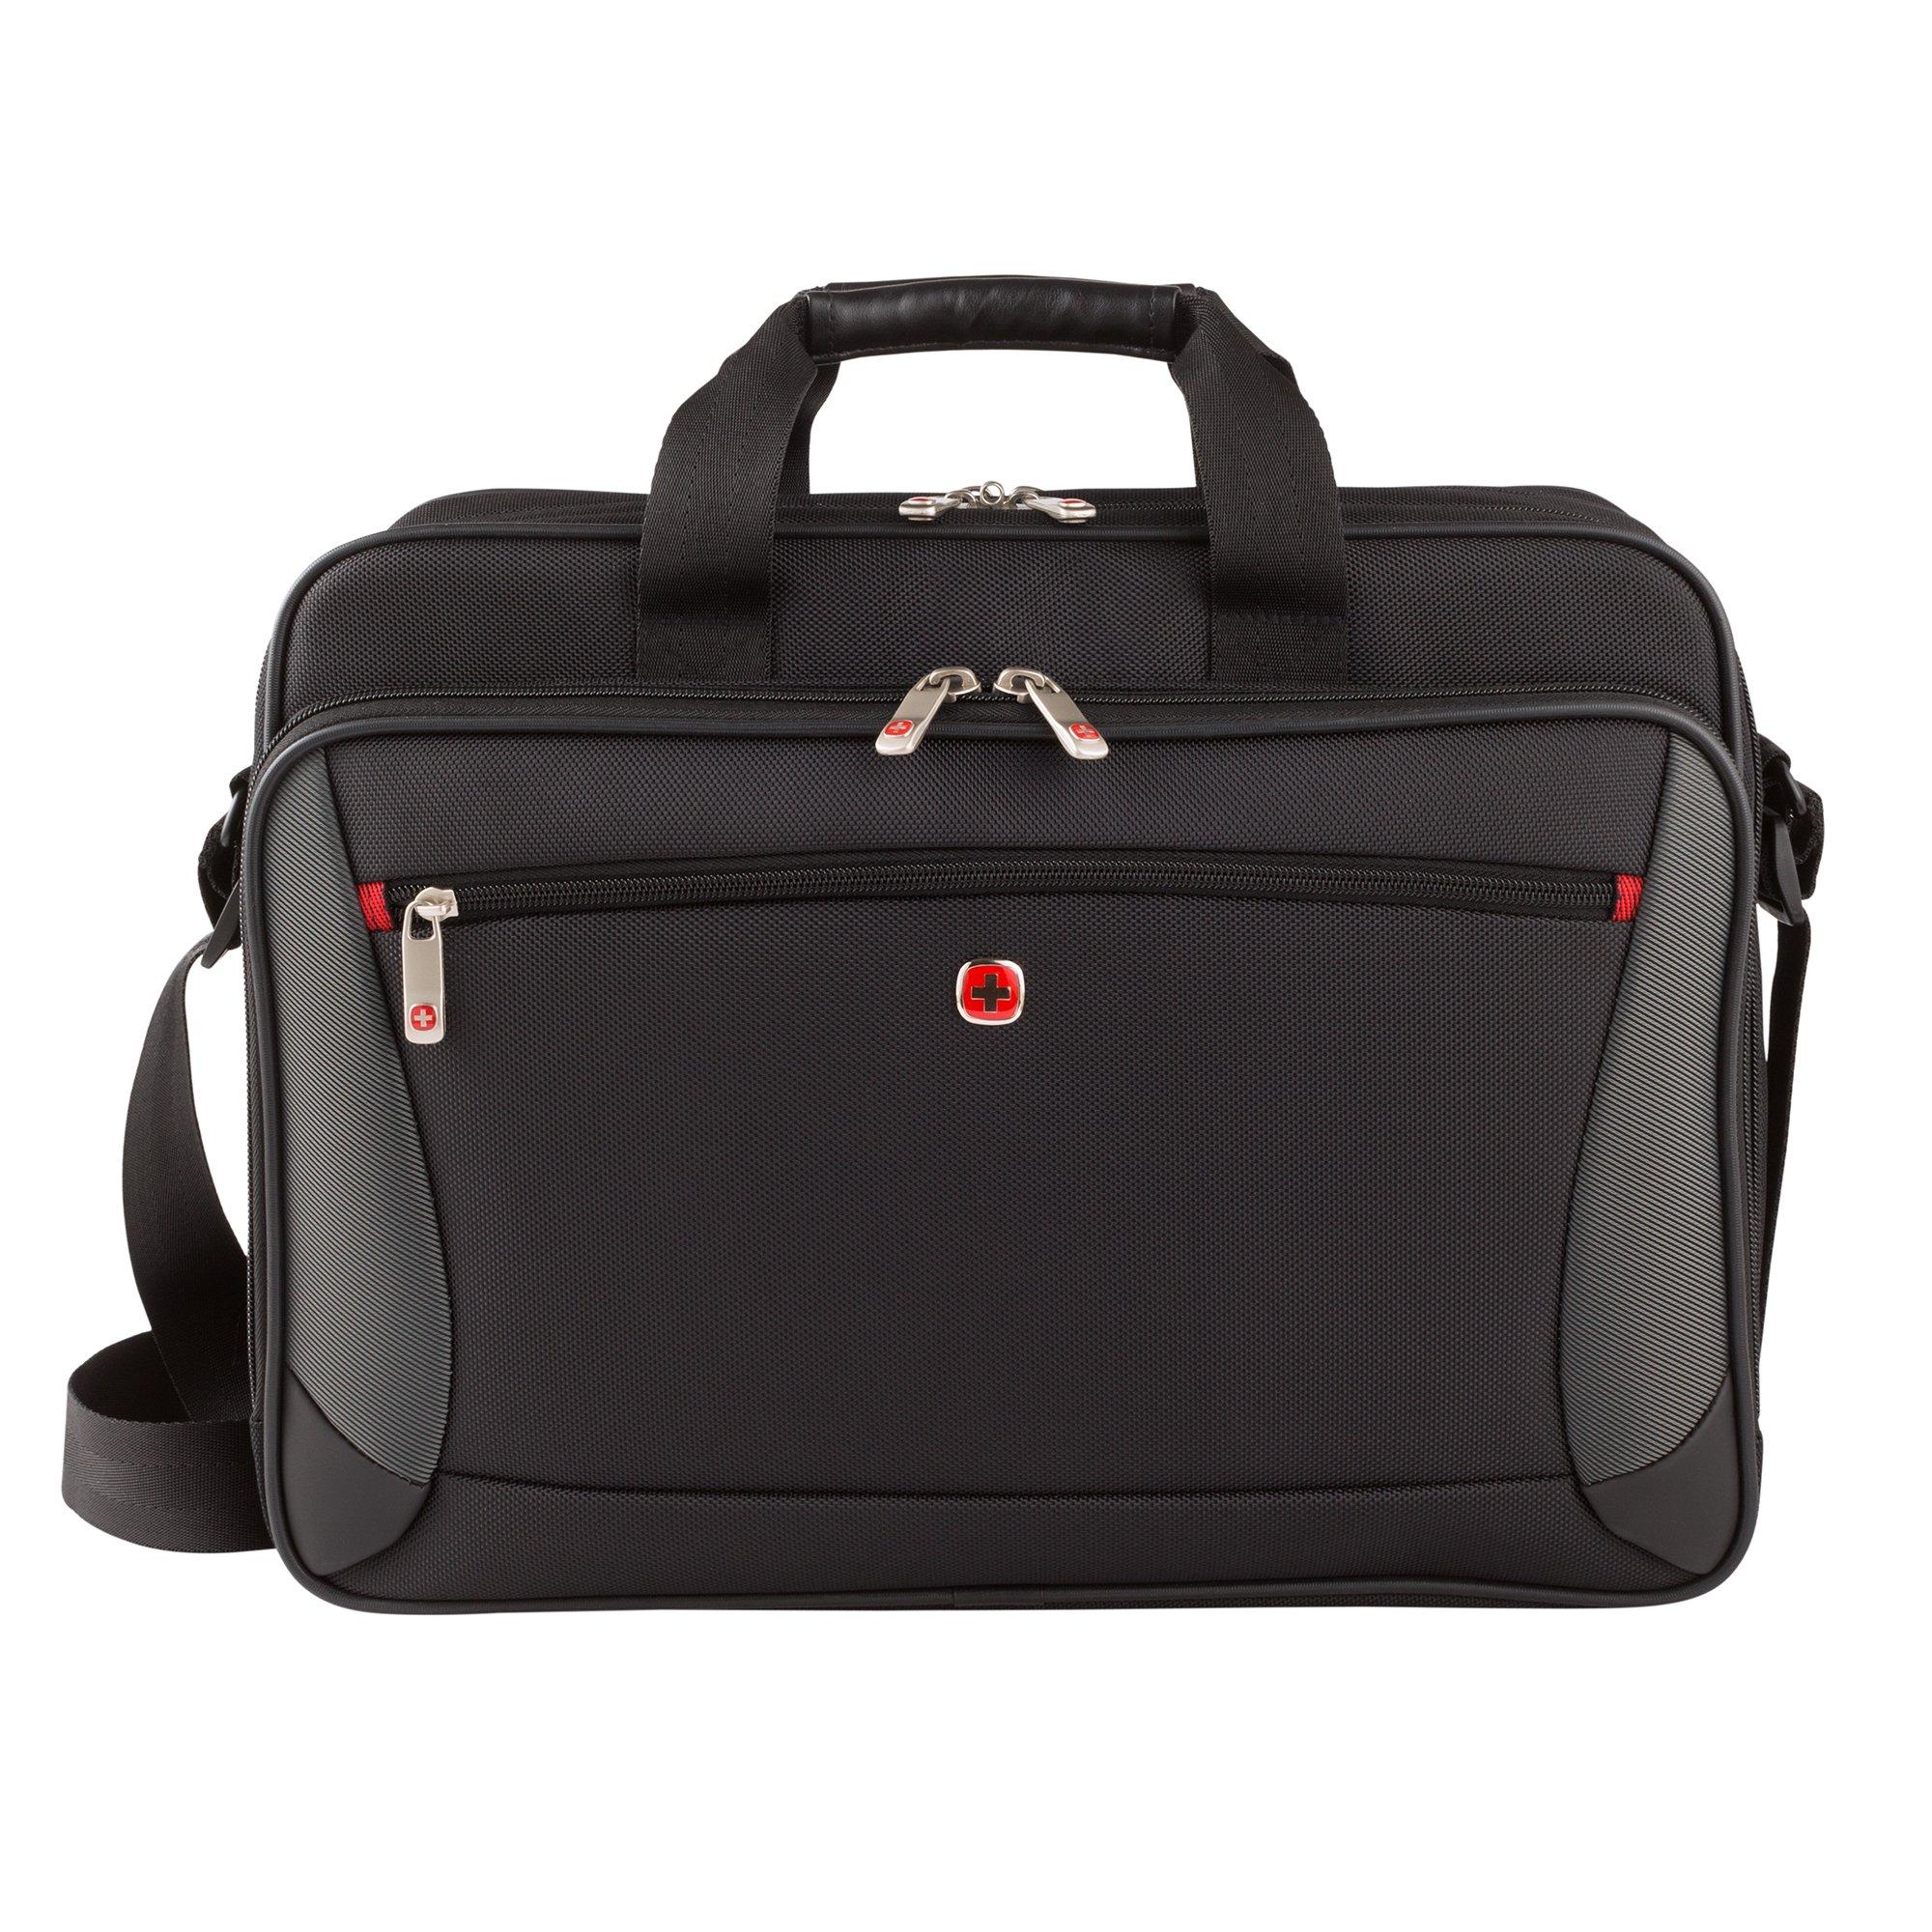 Wenger Luggage Mainframe 15.6'' Laptop Brief Bag, Black, One Size